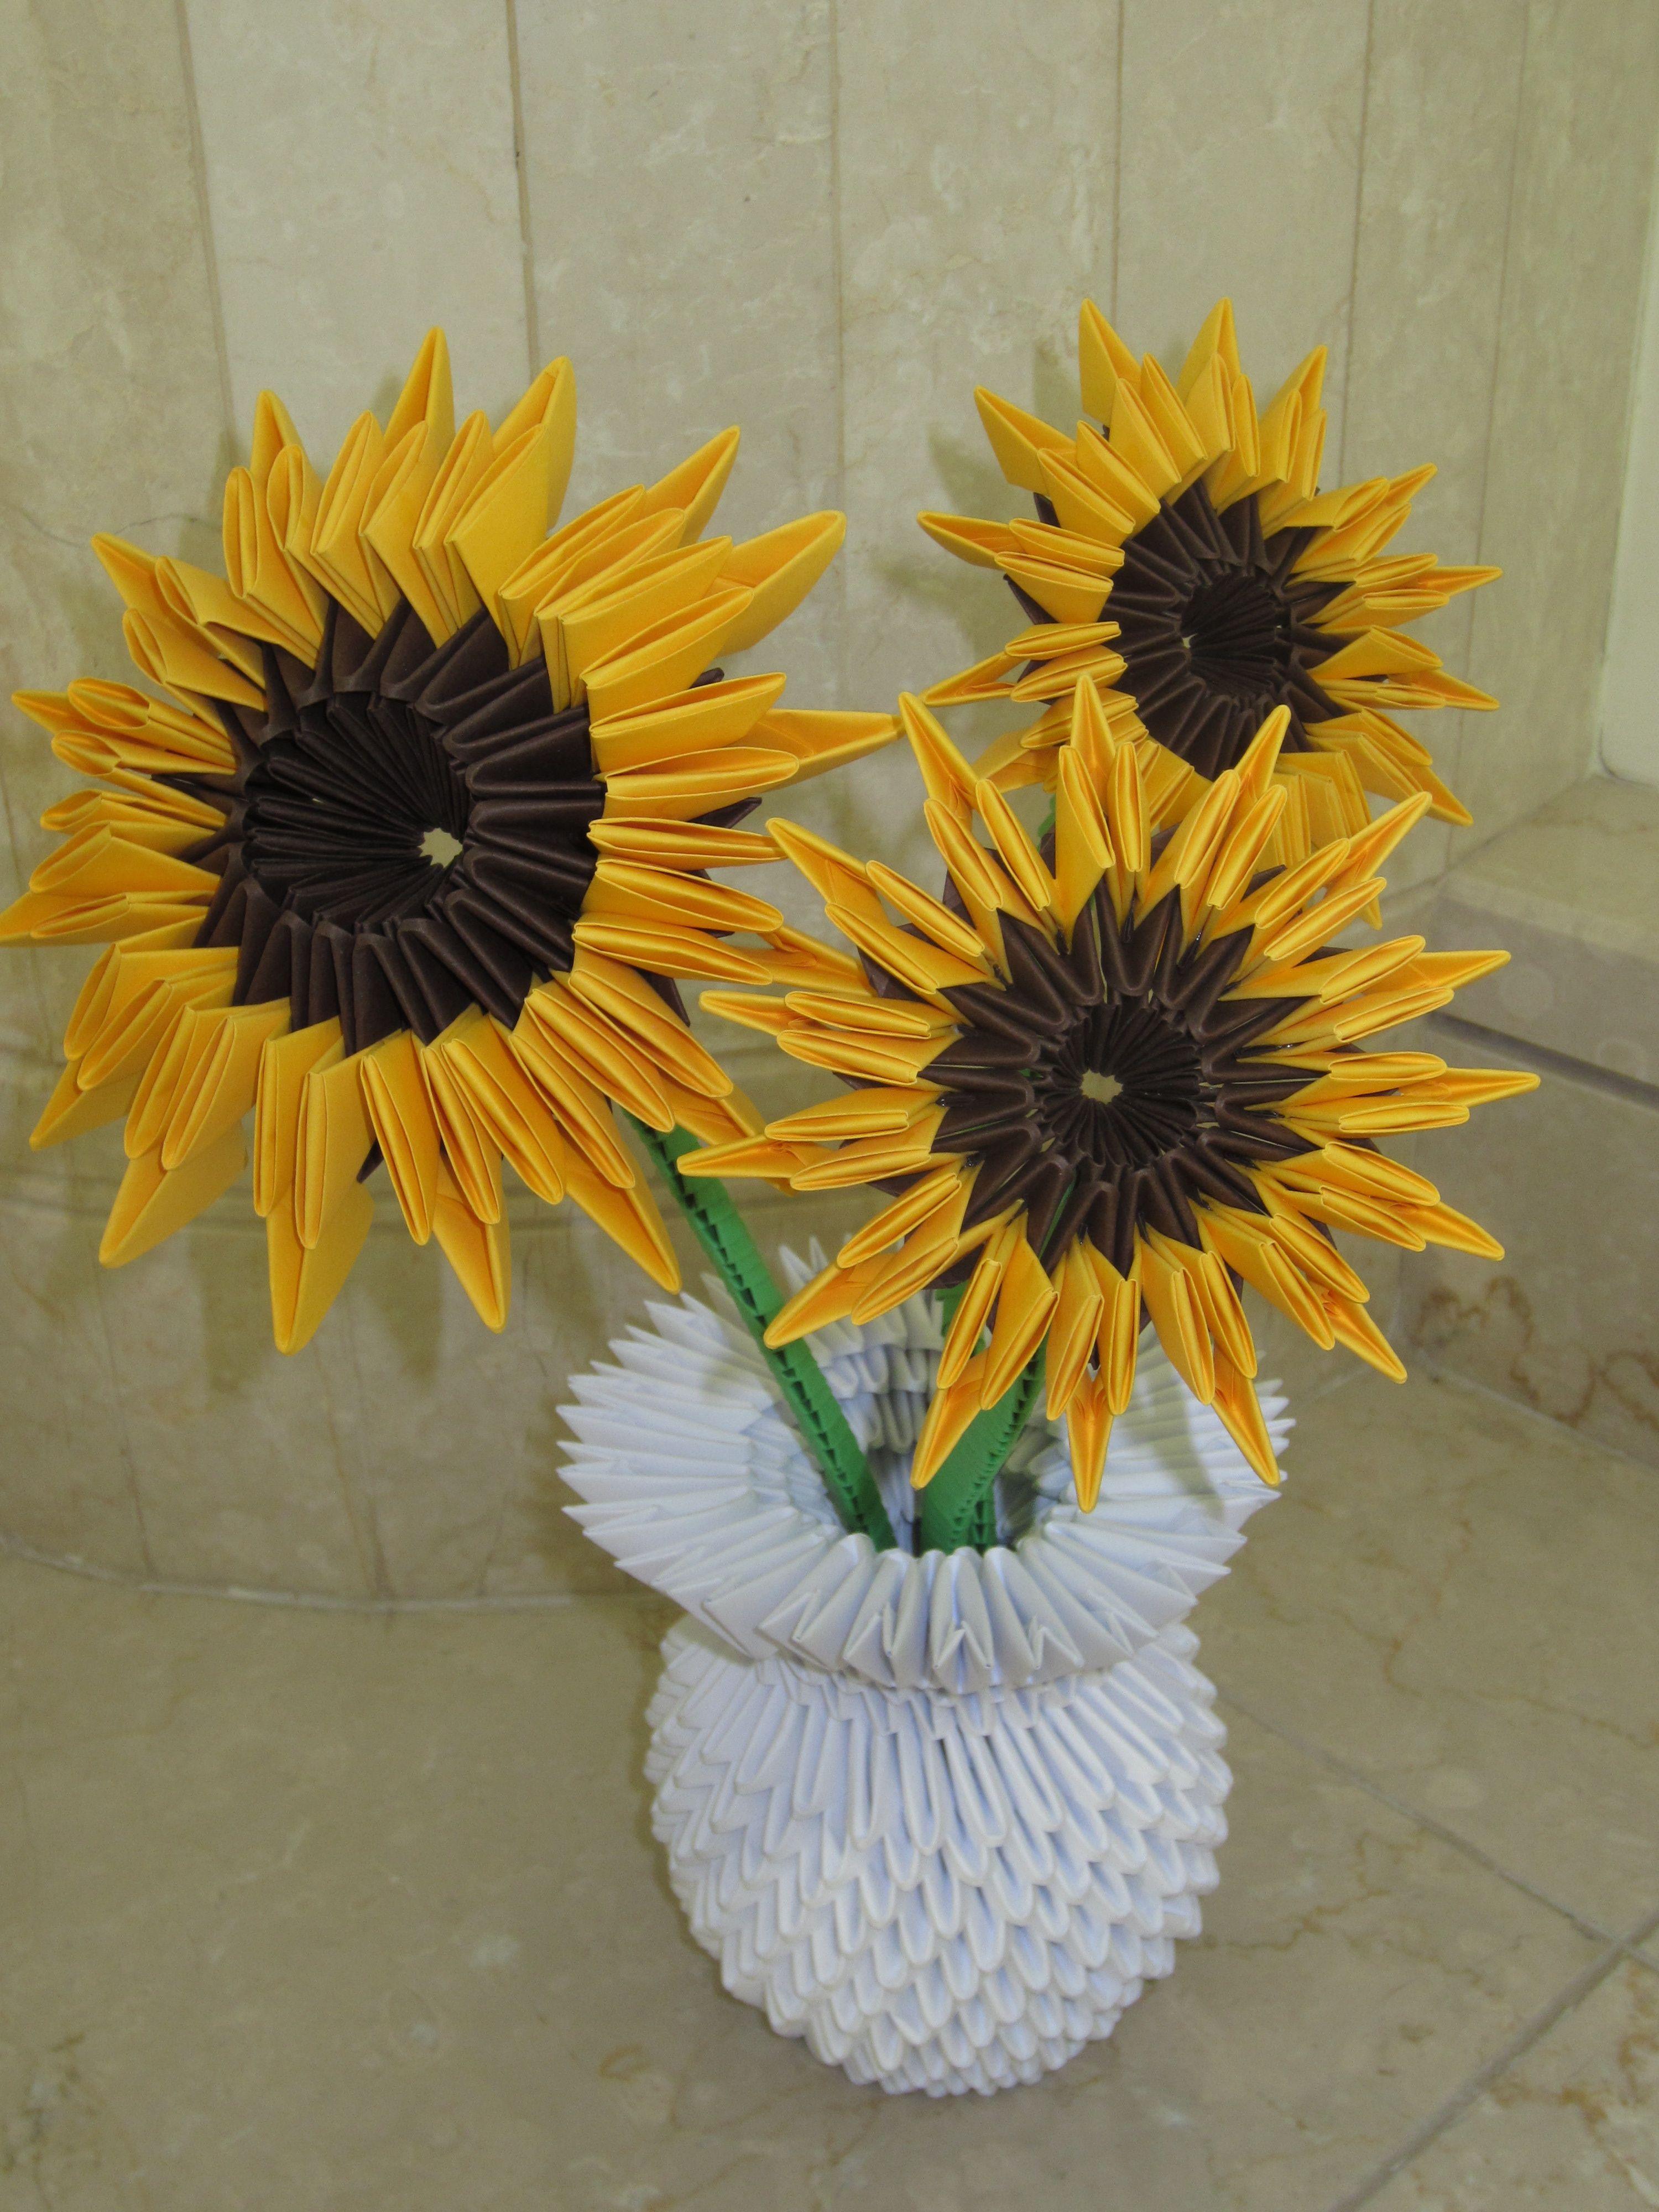 how to make 3d origami flower basket لم يسبق له مثيل الصور + tier3.xyz | 4000x3000